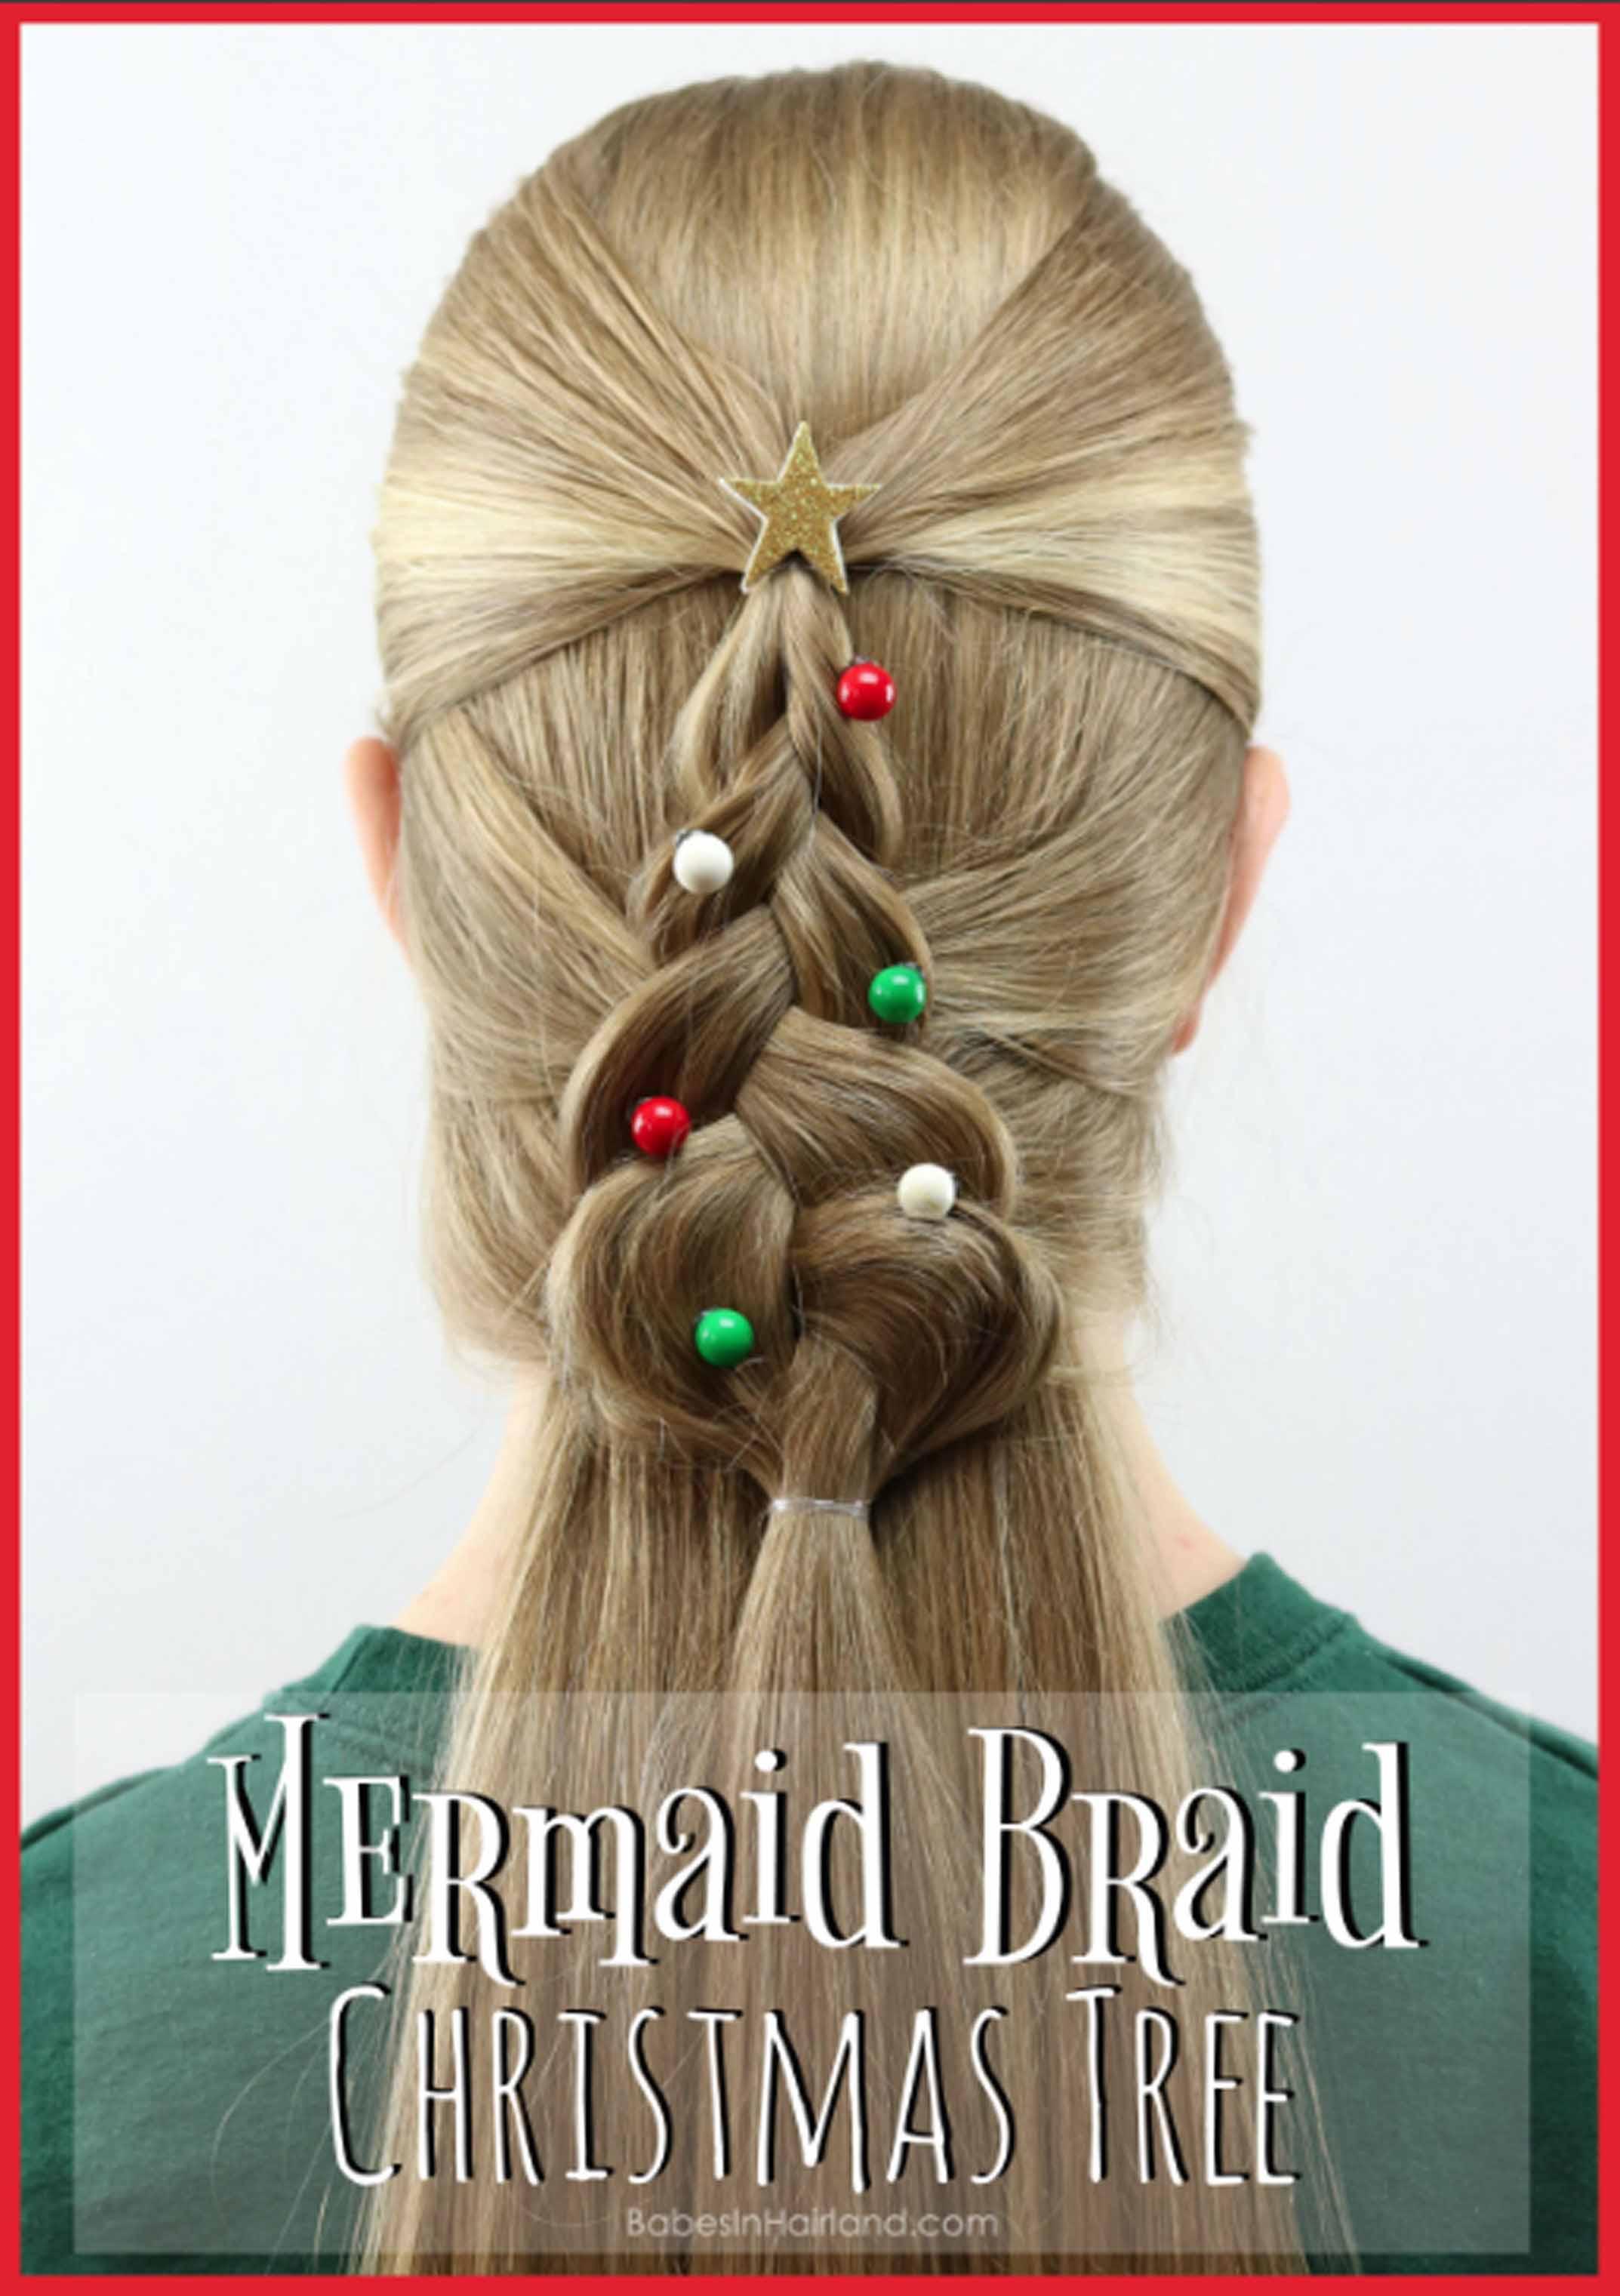 Mermaid Braid Christmas Tree Hairstyle A Cute Christmas Hairstyle